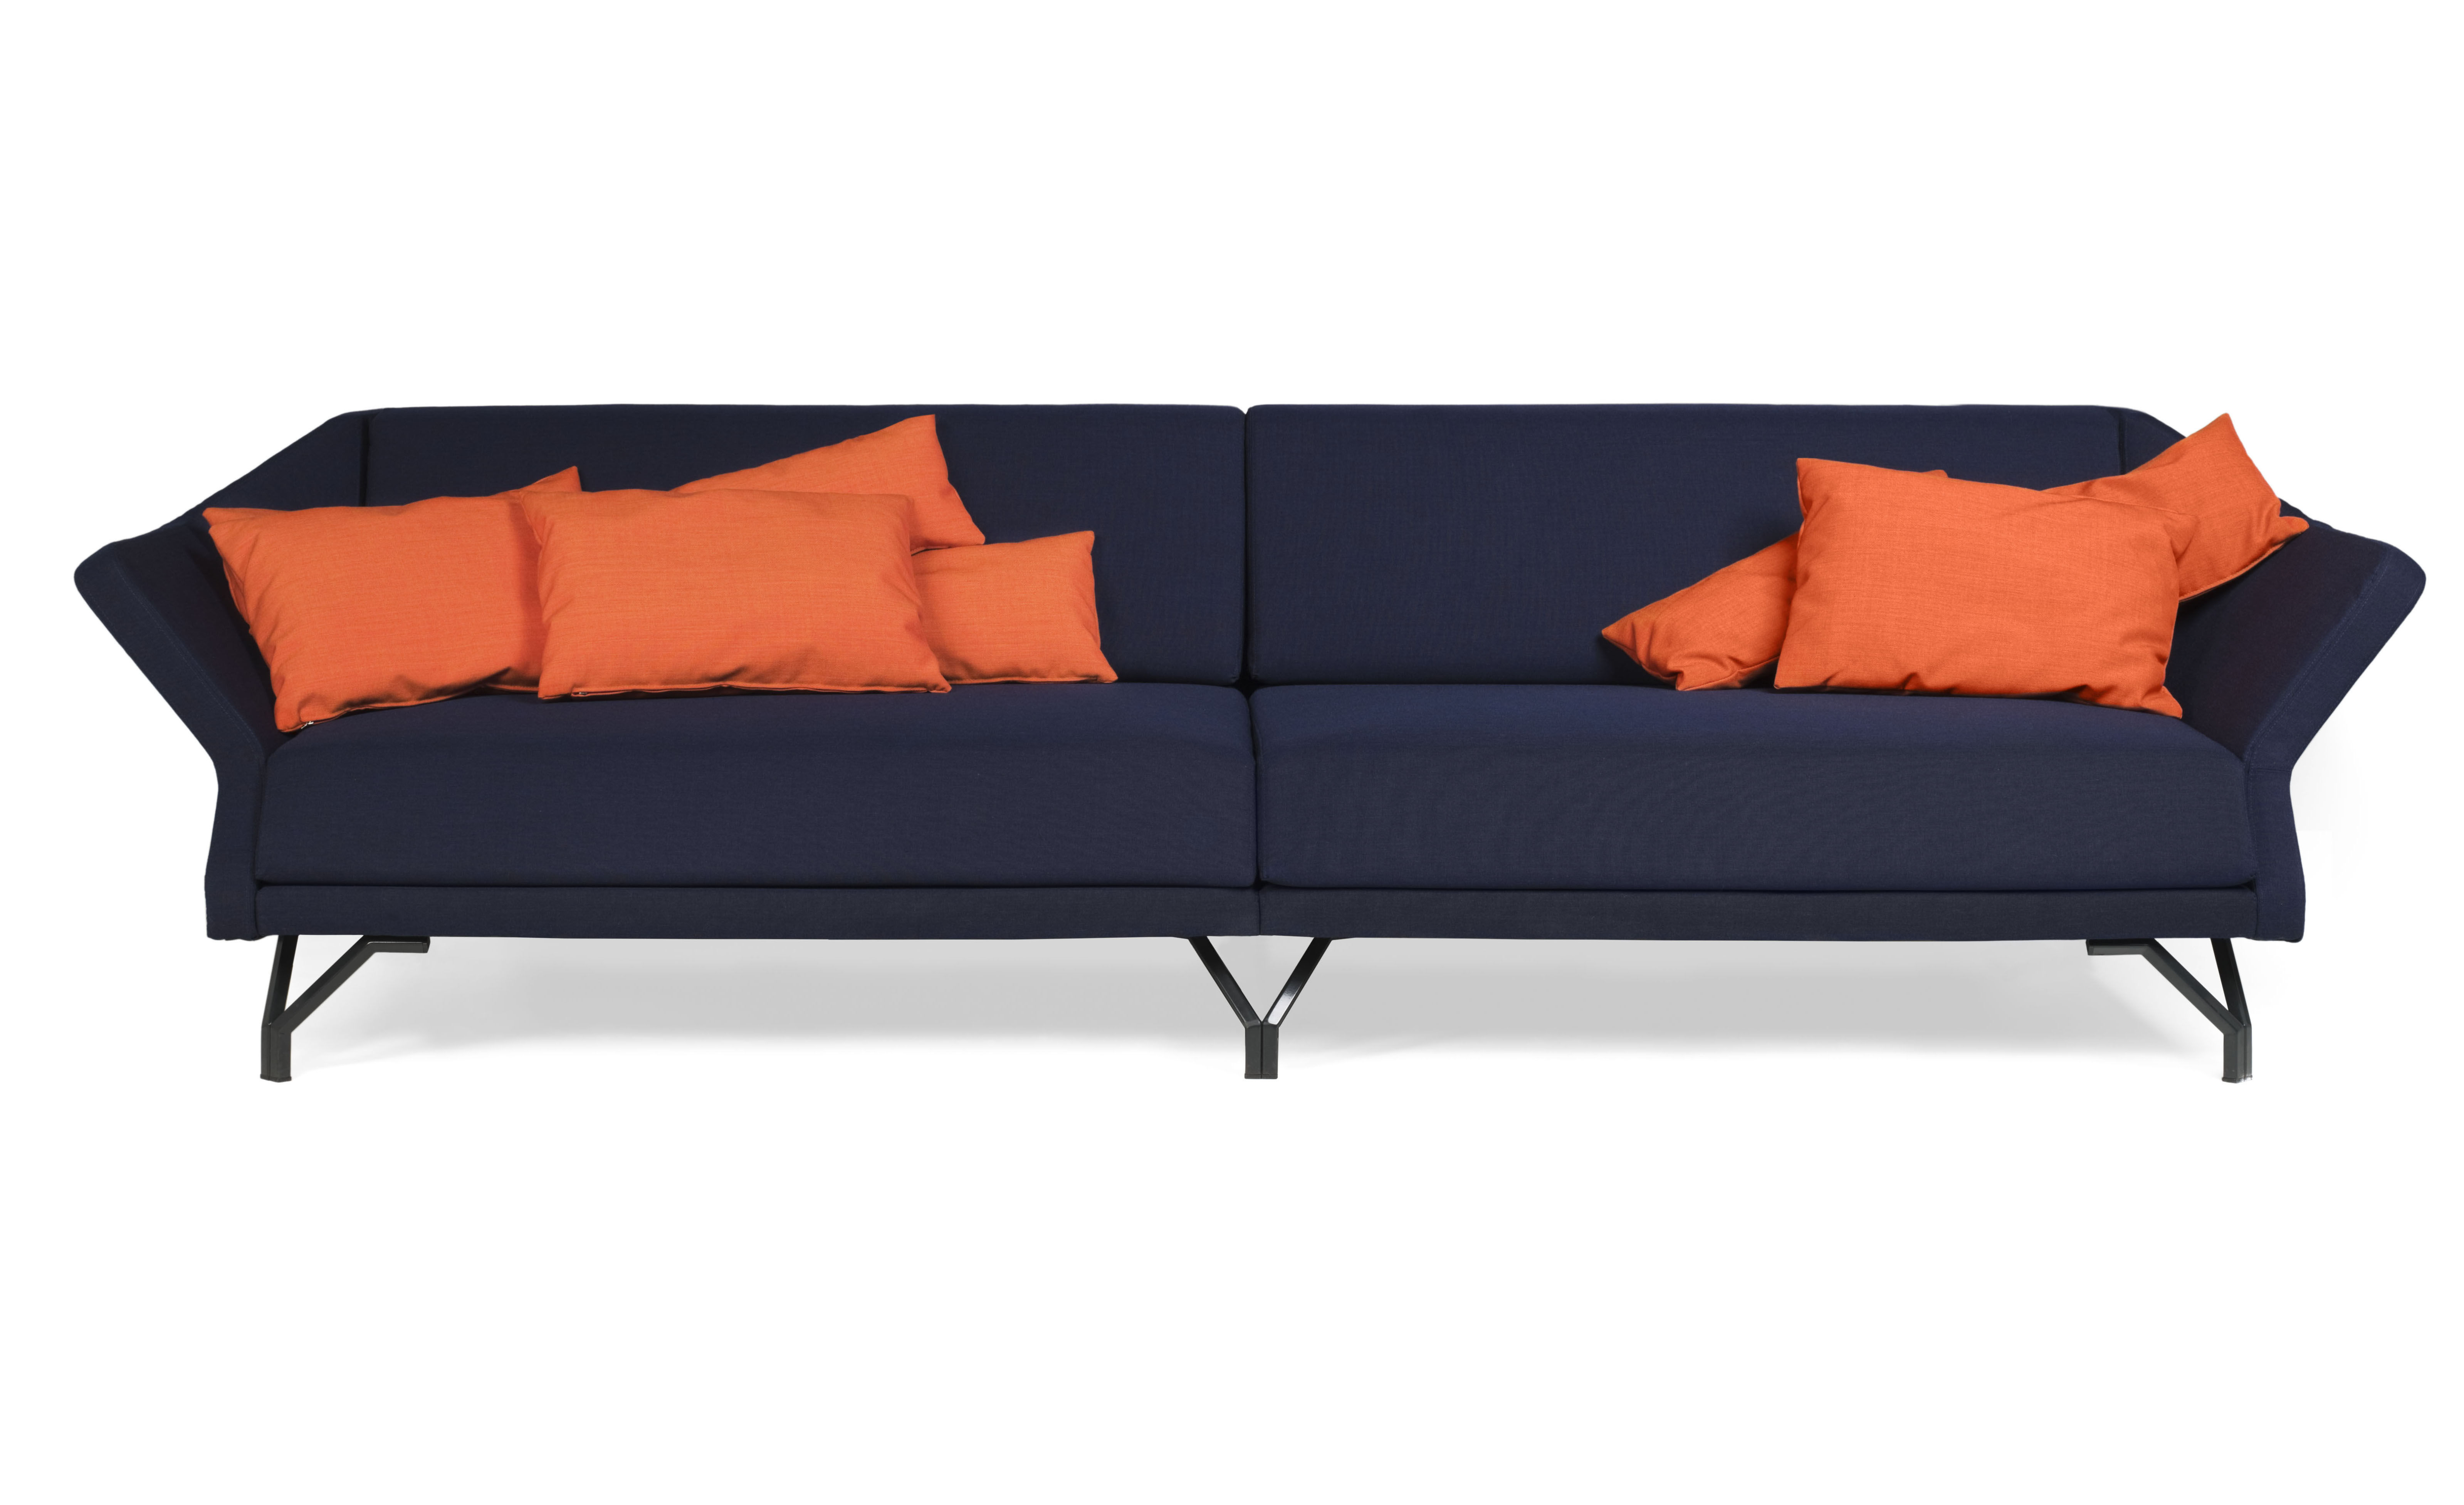 canap droit shogun 4 places l 268 cm bleu skitsch. Black Bedroom Furniture Sets. Home Design Ideas